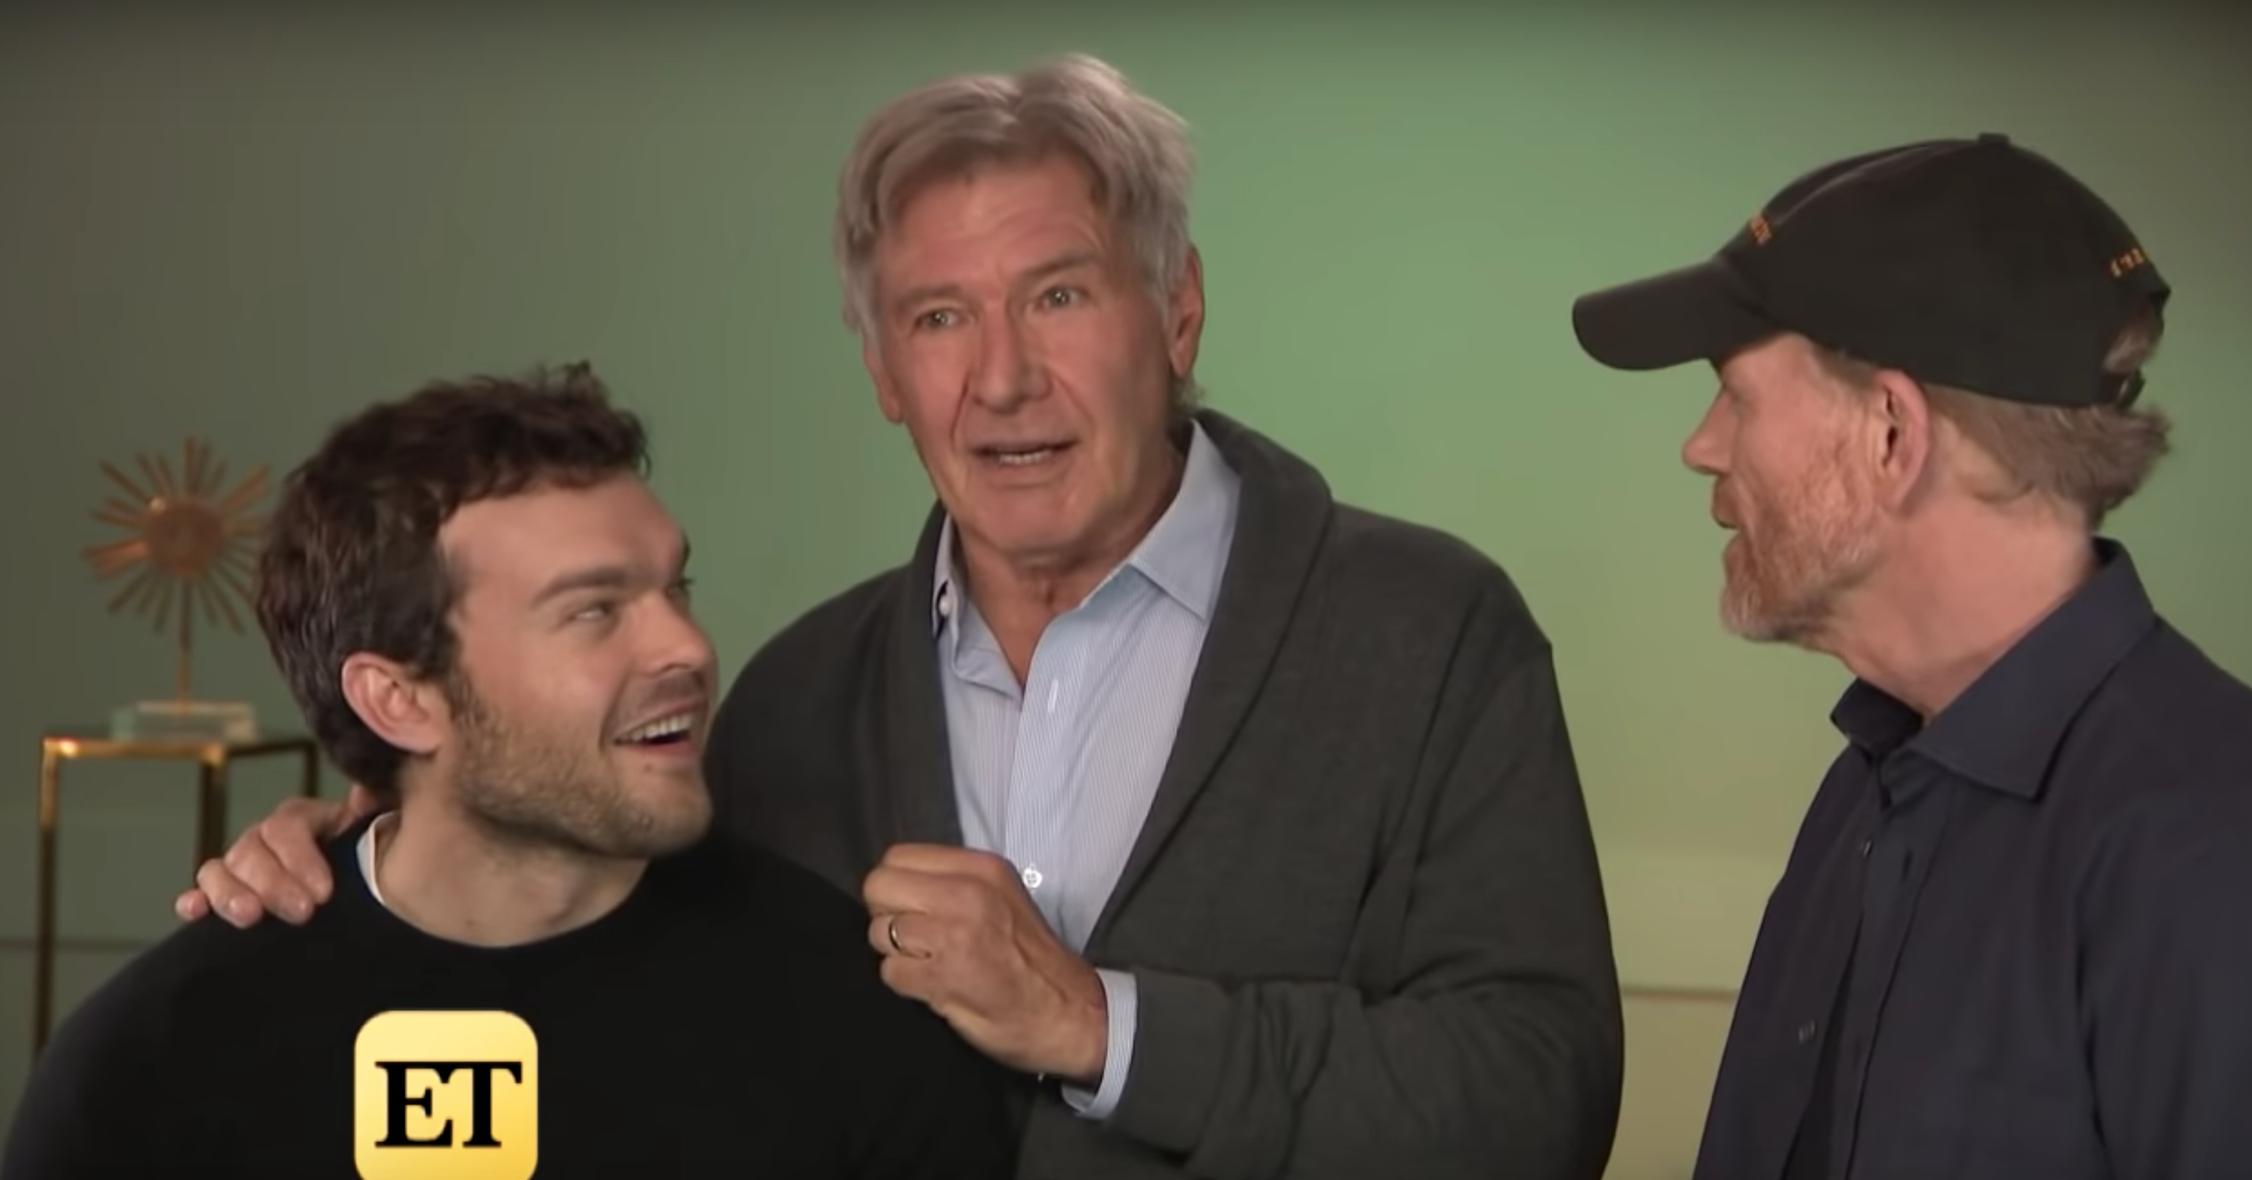 Hero Harrison Ford may die in the new series of Star Wars 02/19/2015 18